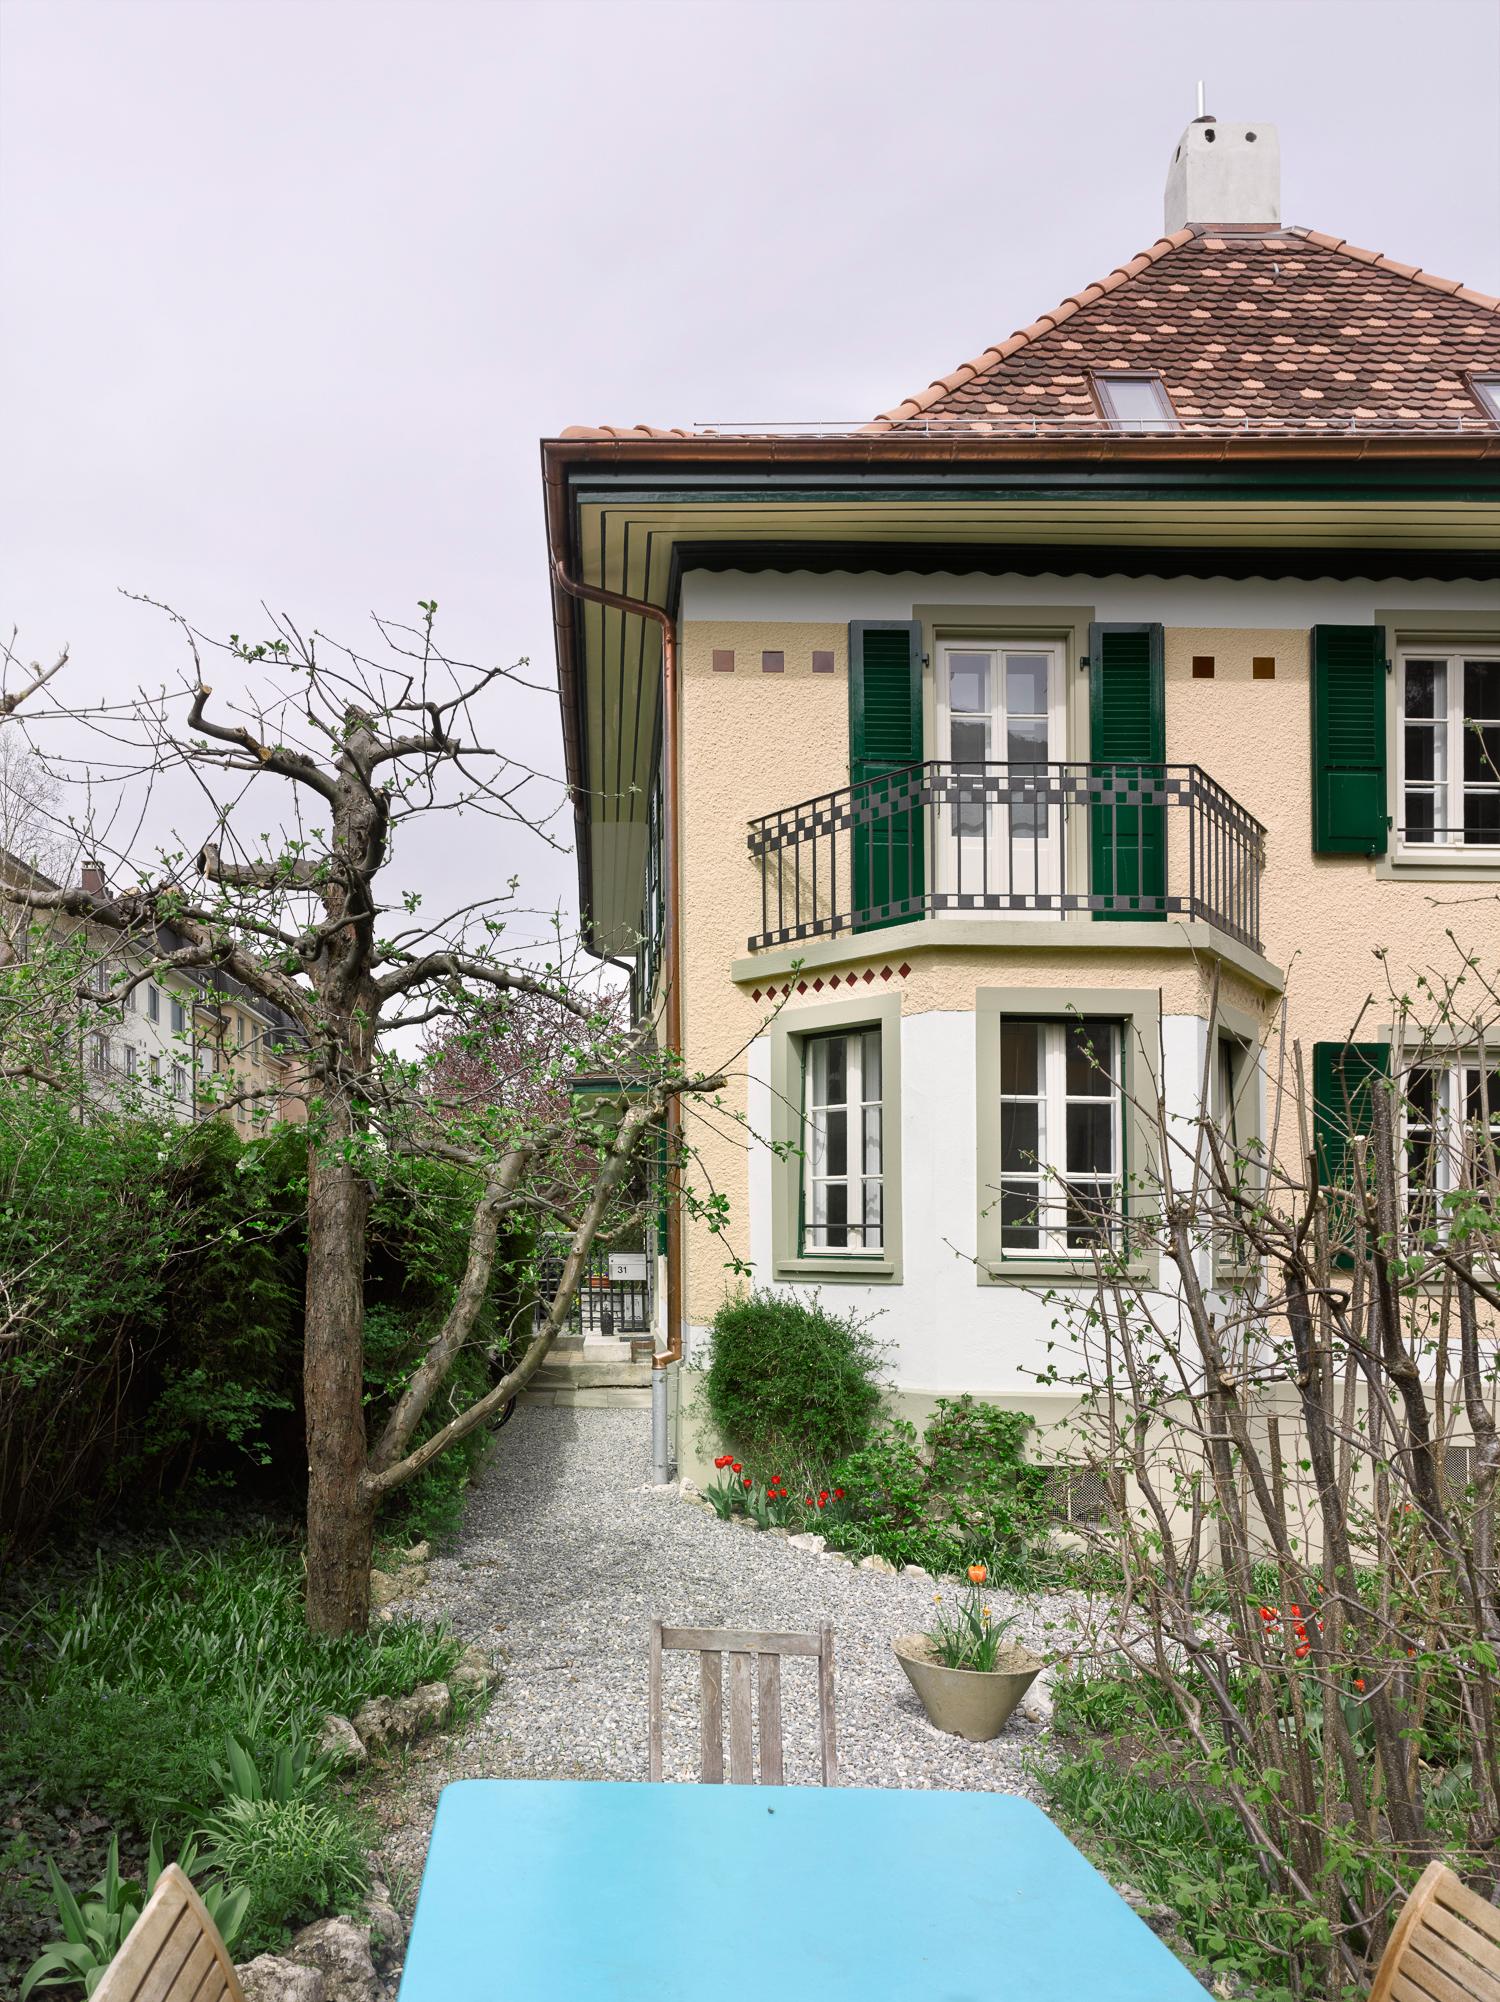 Gempeler Wohnhaus Bern